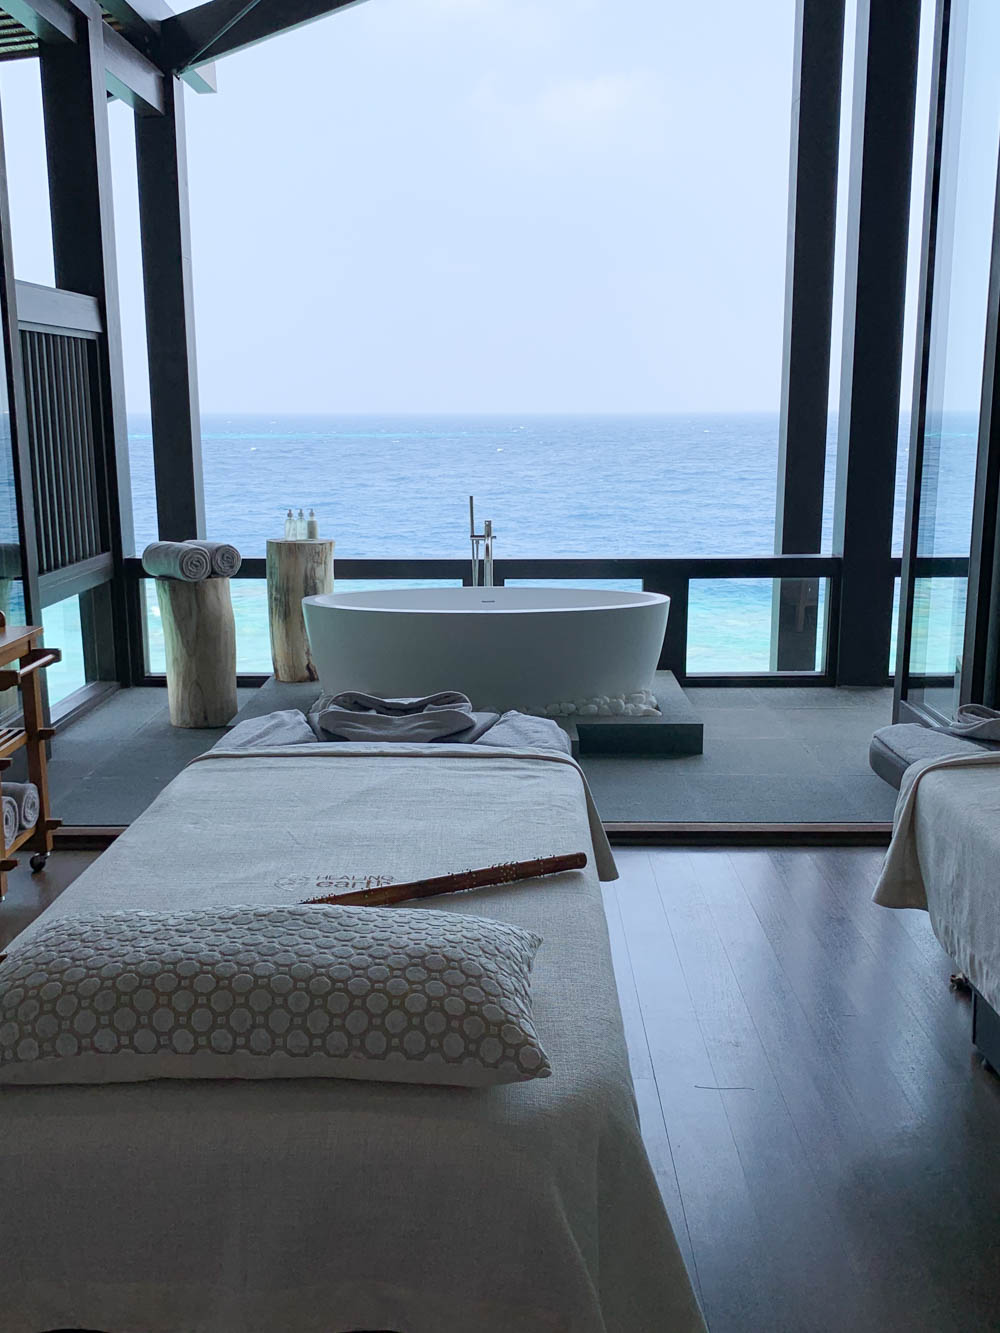 Maldives_Resort_Honeymoon_Kudadoo_MaldivesTravelAdvisor-21.jpg